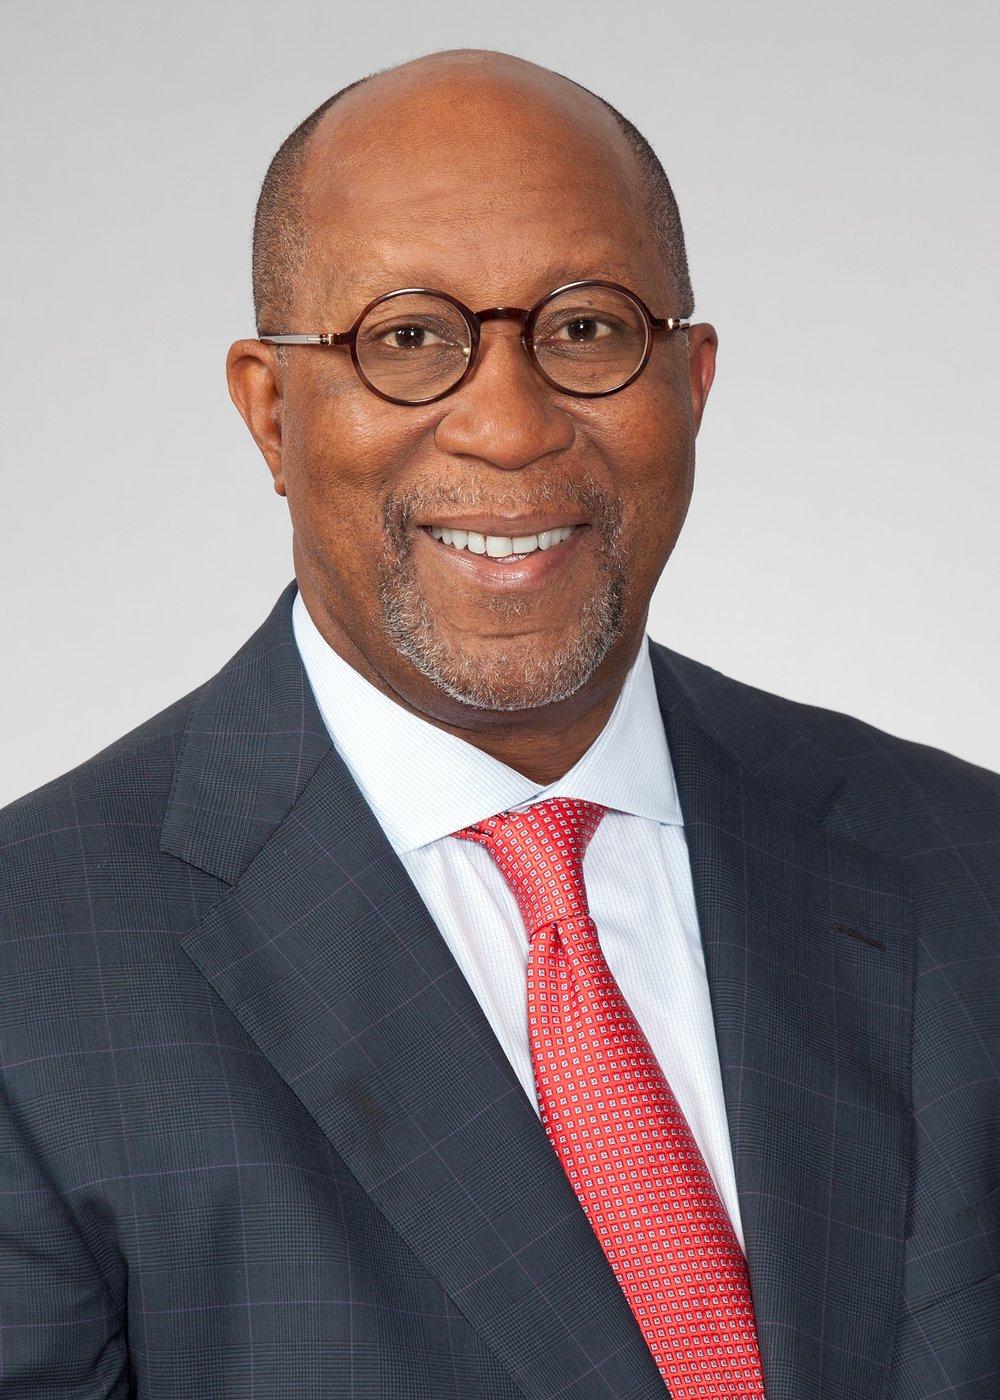 Ambassador Ron Kirk